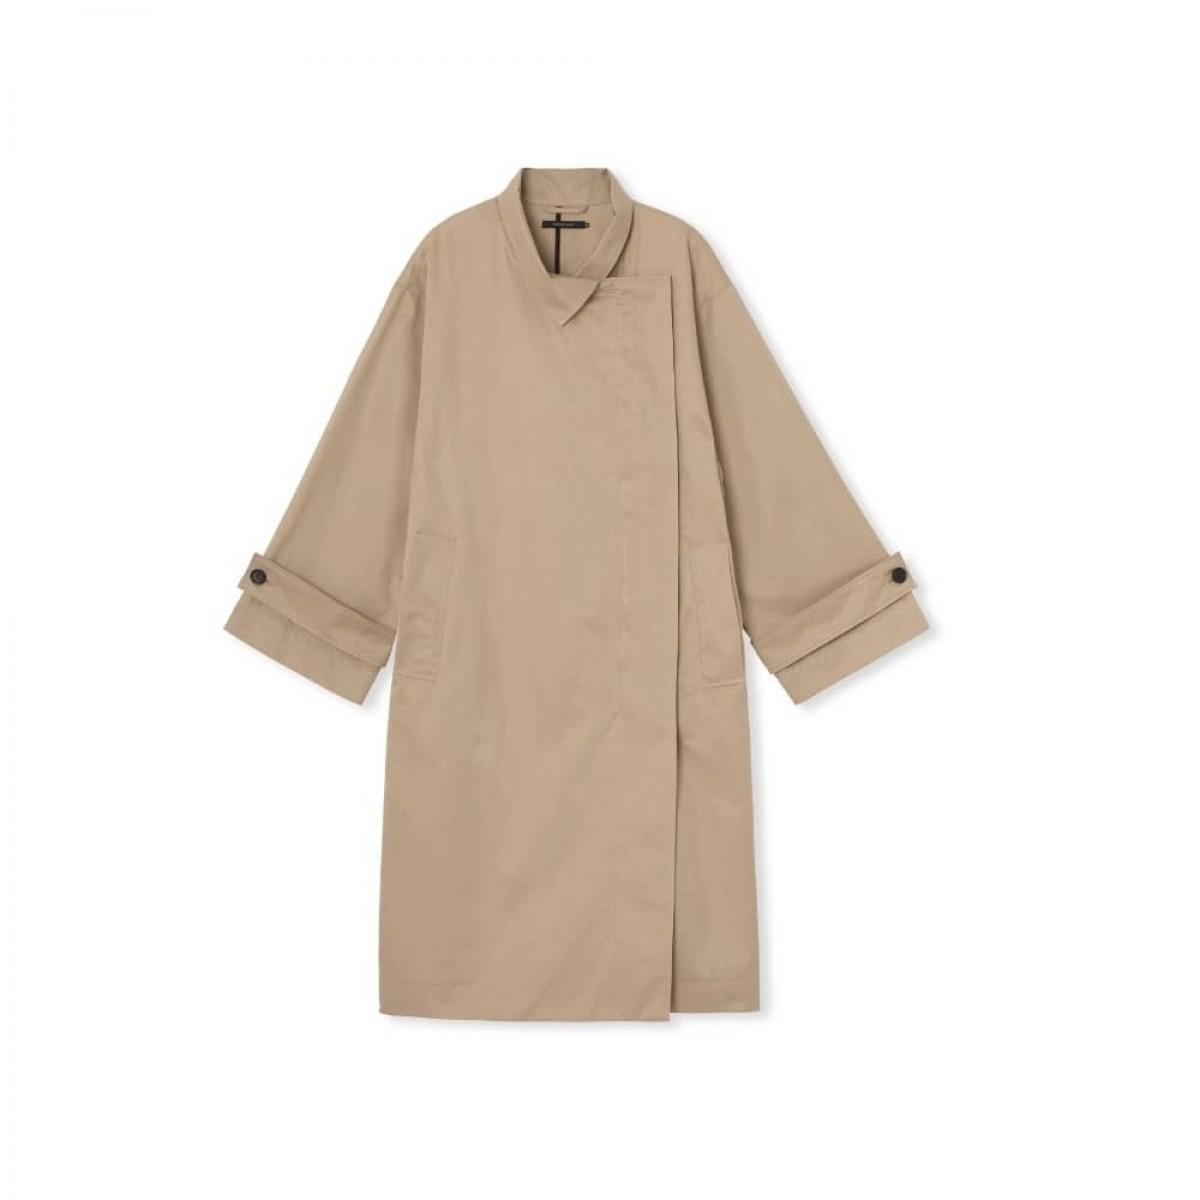 ricka coat - sand